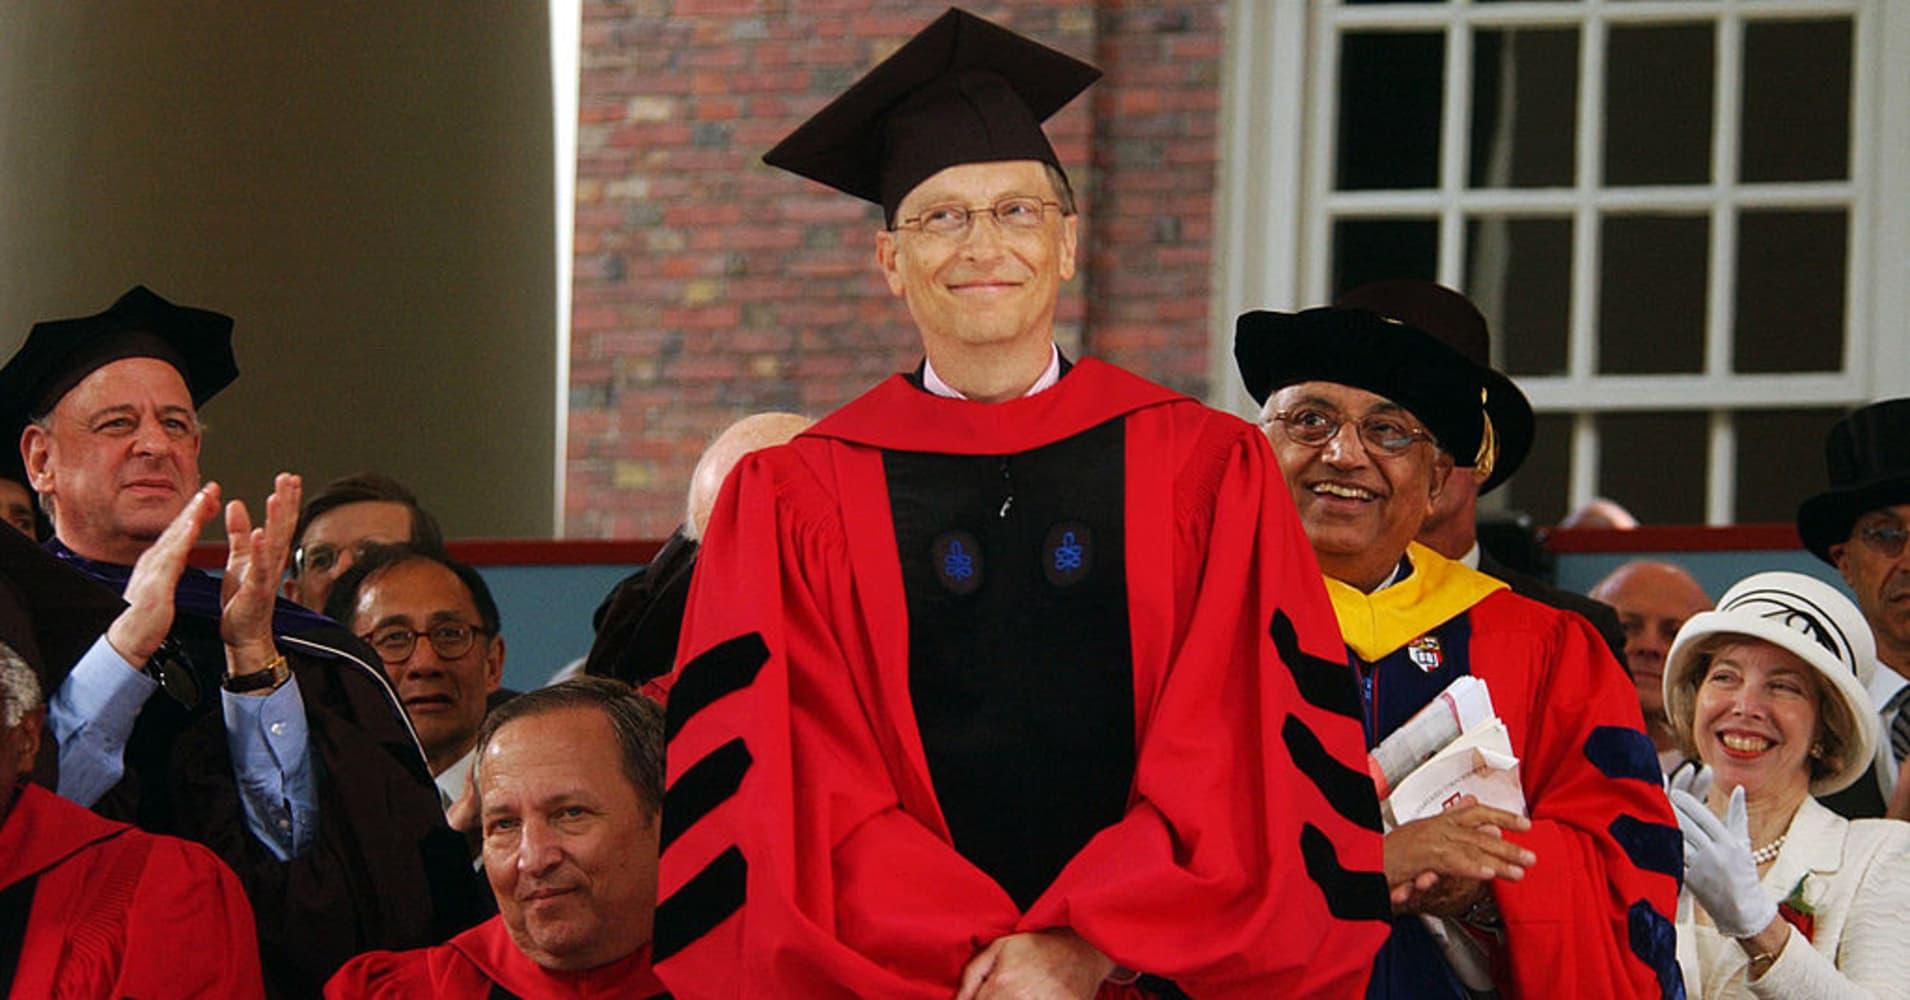 Zuckerberg should study the wisdom in Bill Gates' Harvard address